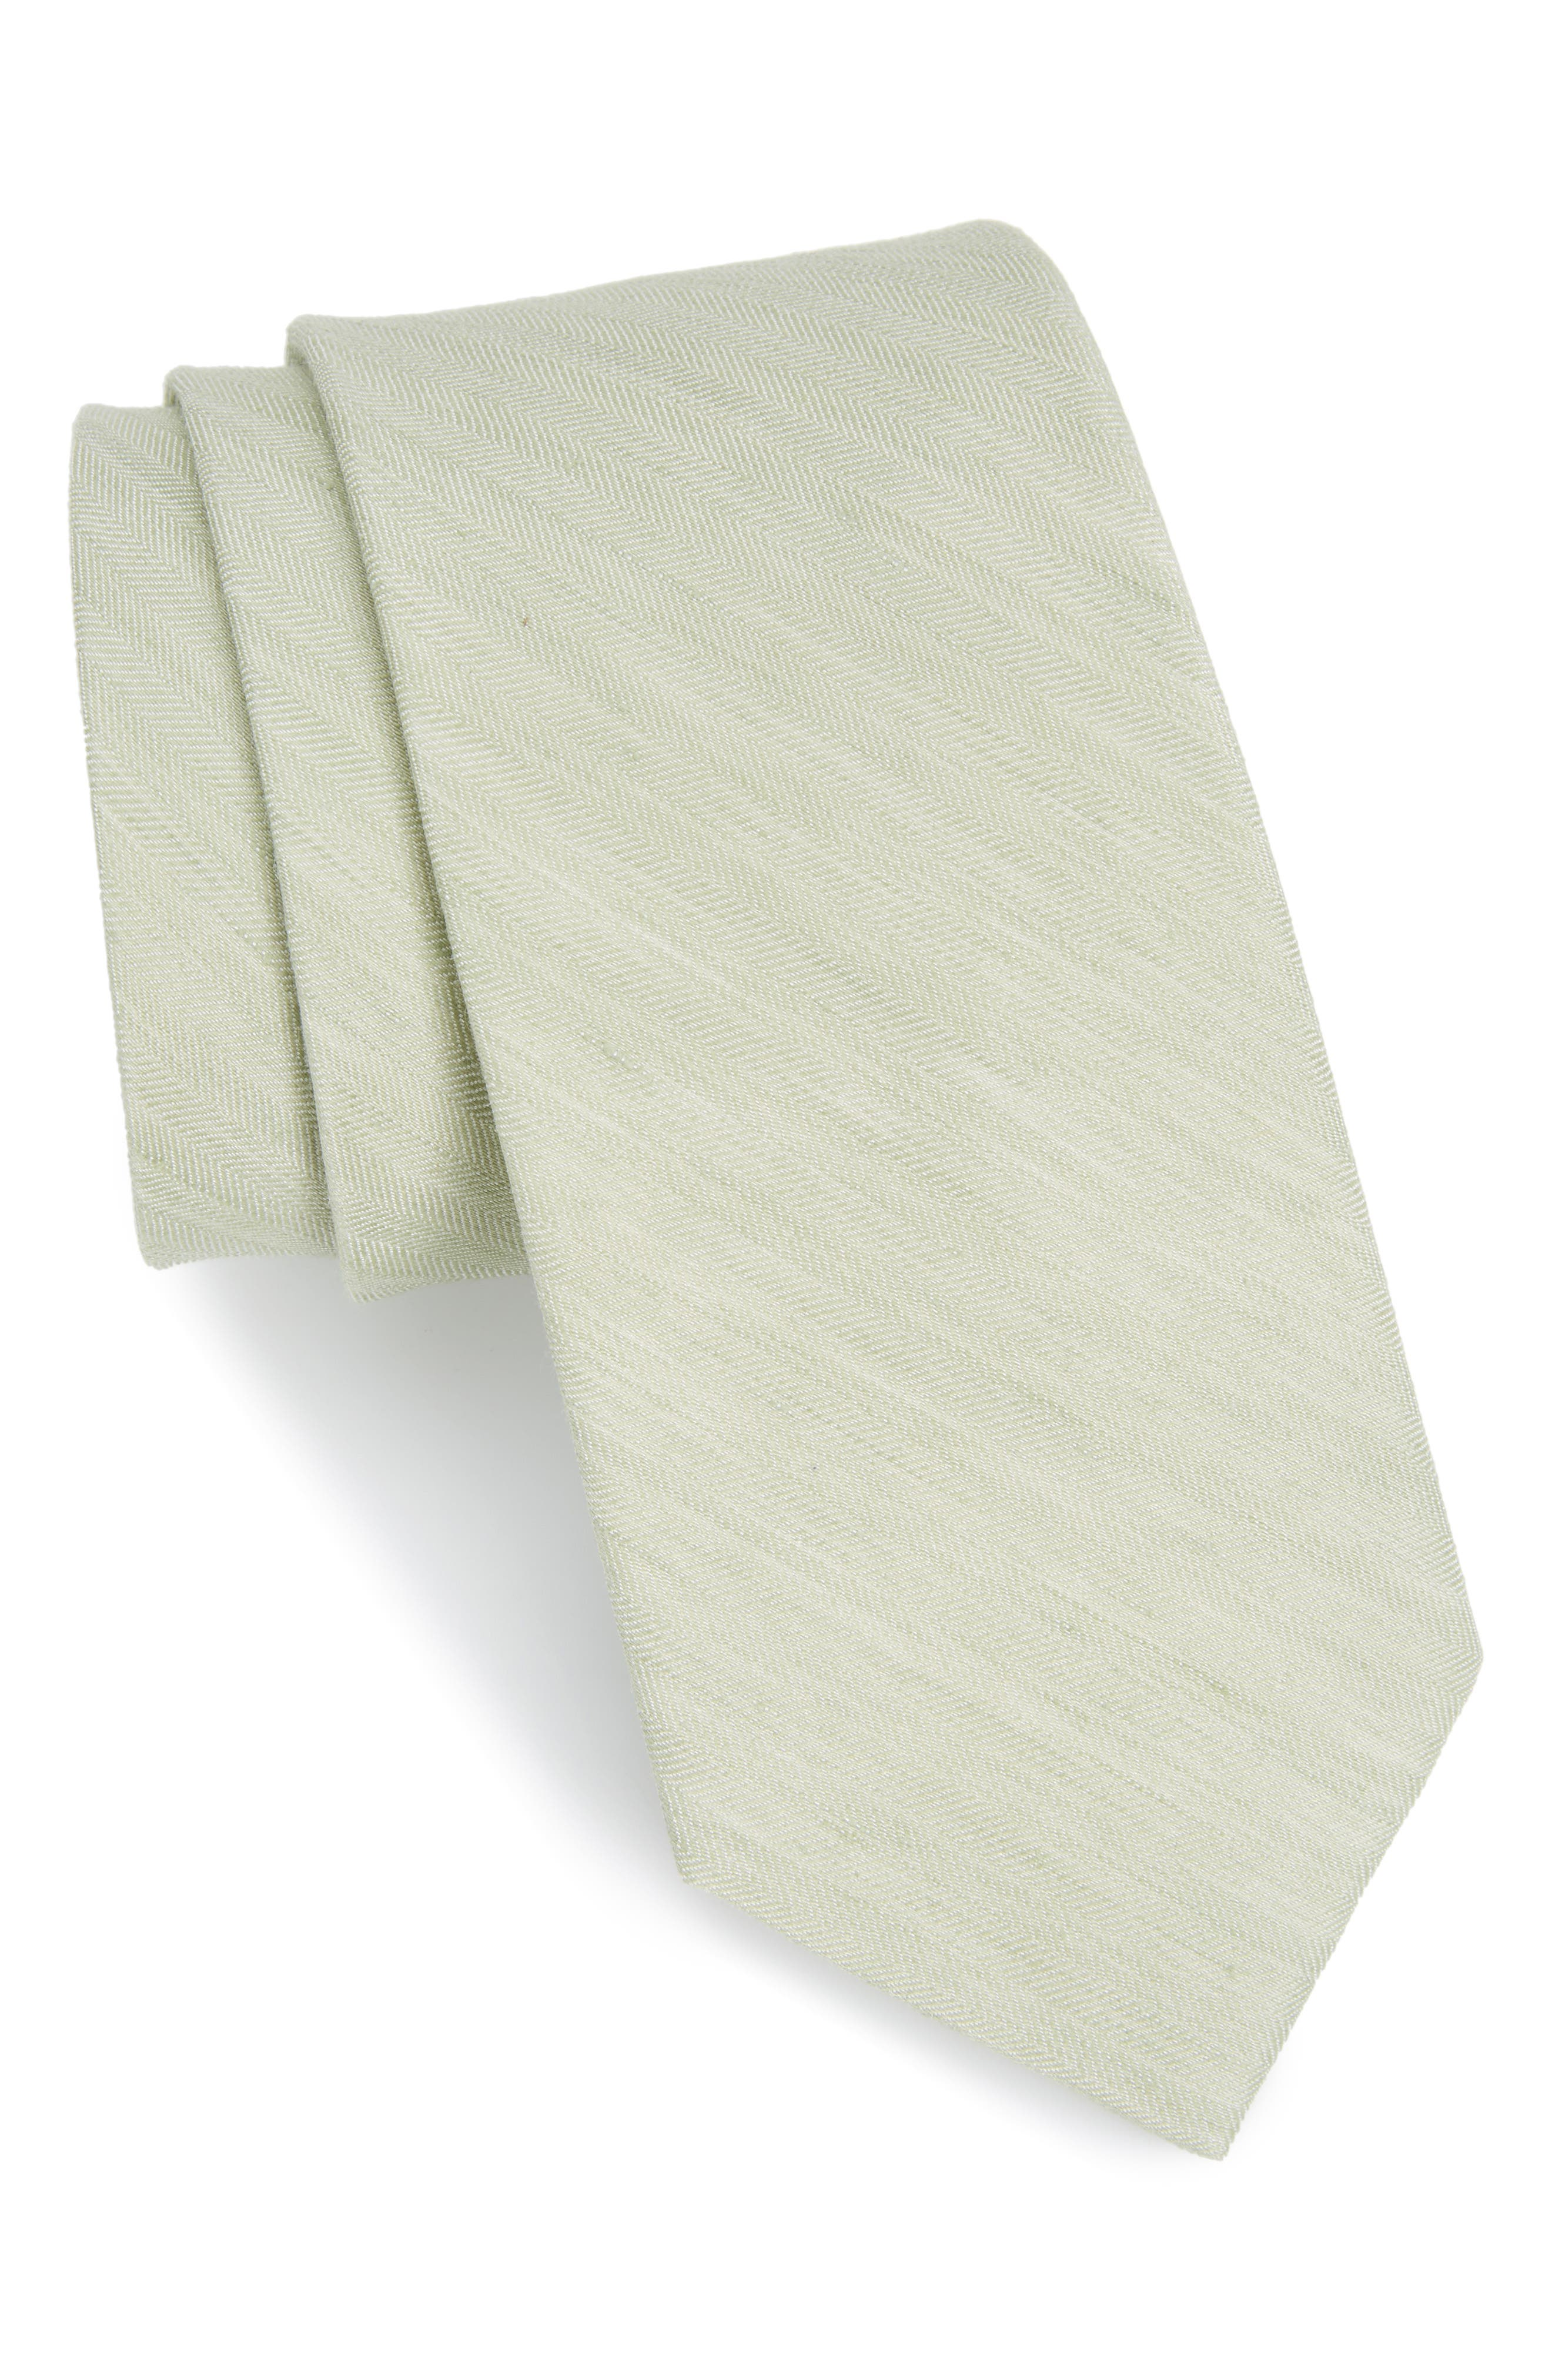 Alternate Image 1 Selected - The Tie Bar Solid Linen & Silk Tie